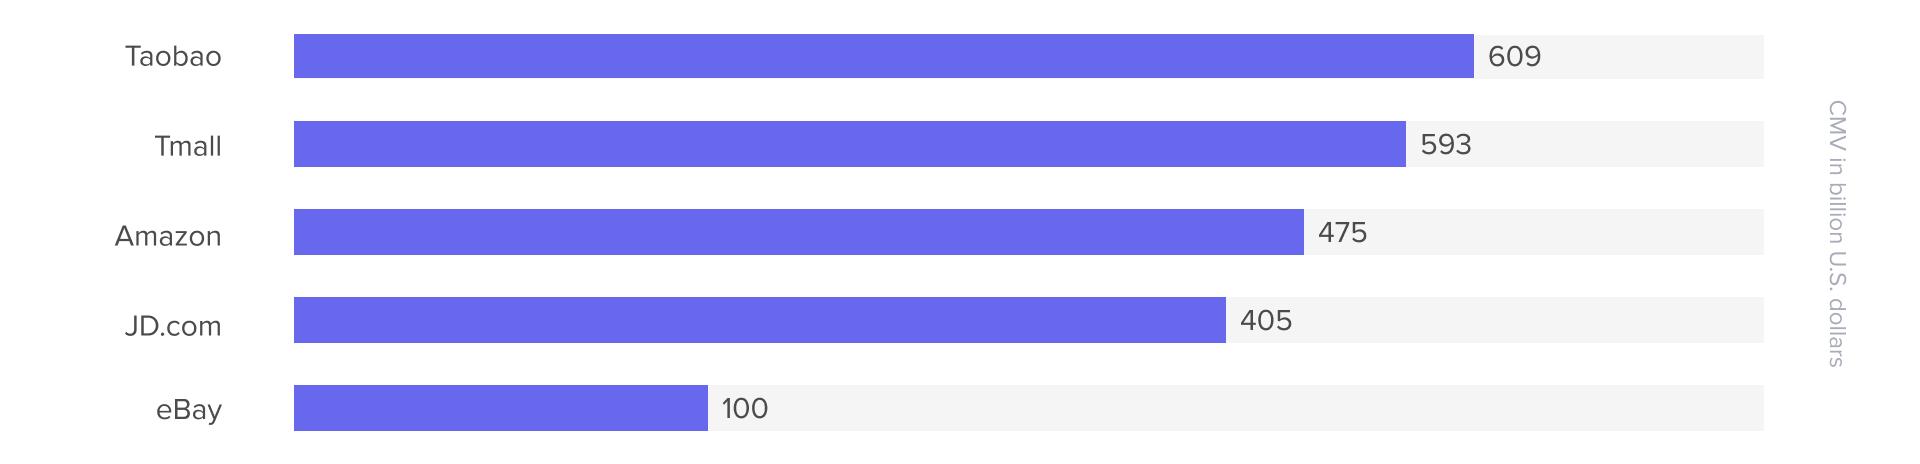 Most popular online marketplaces worldwide in 2020